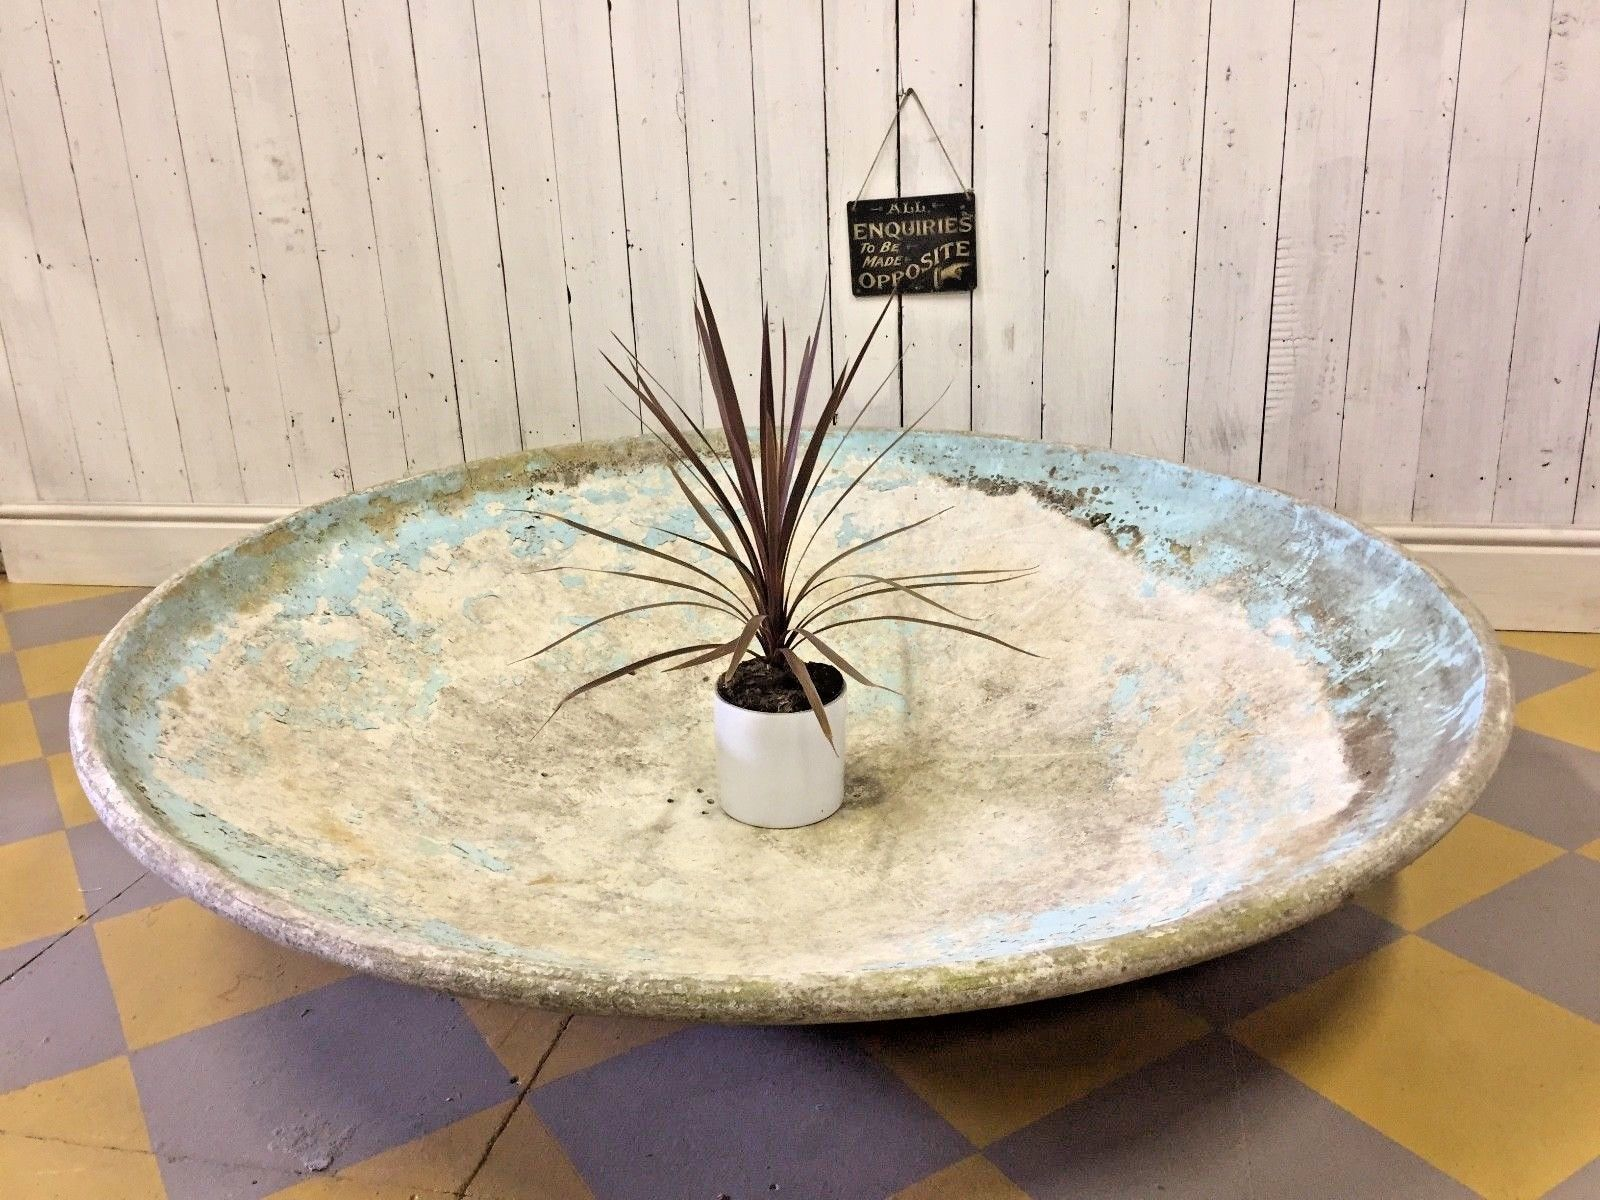 xl-willy-guhl-bowl-garden-planters-design-flower-tubs-pot-mid-danish-clam-diablo